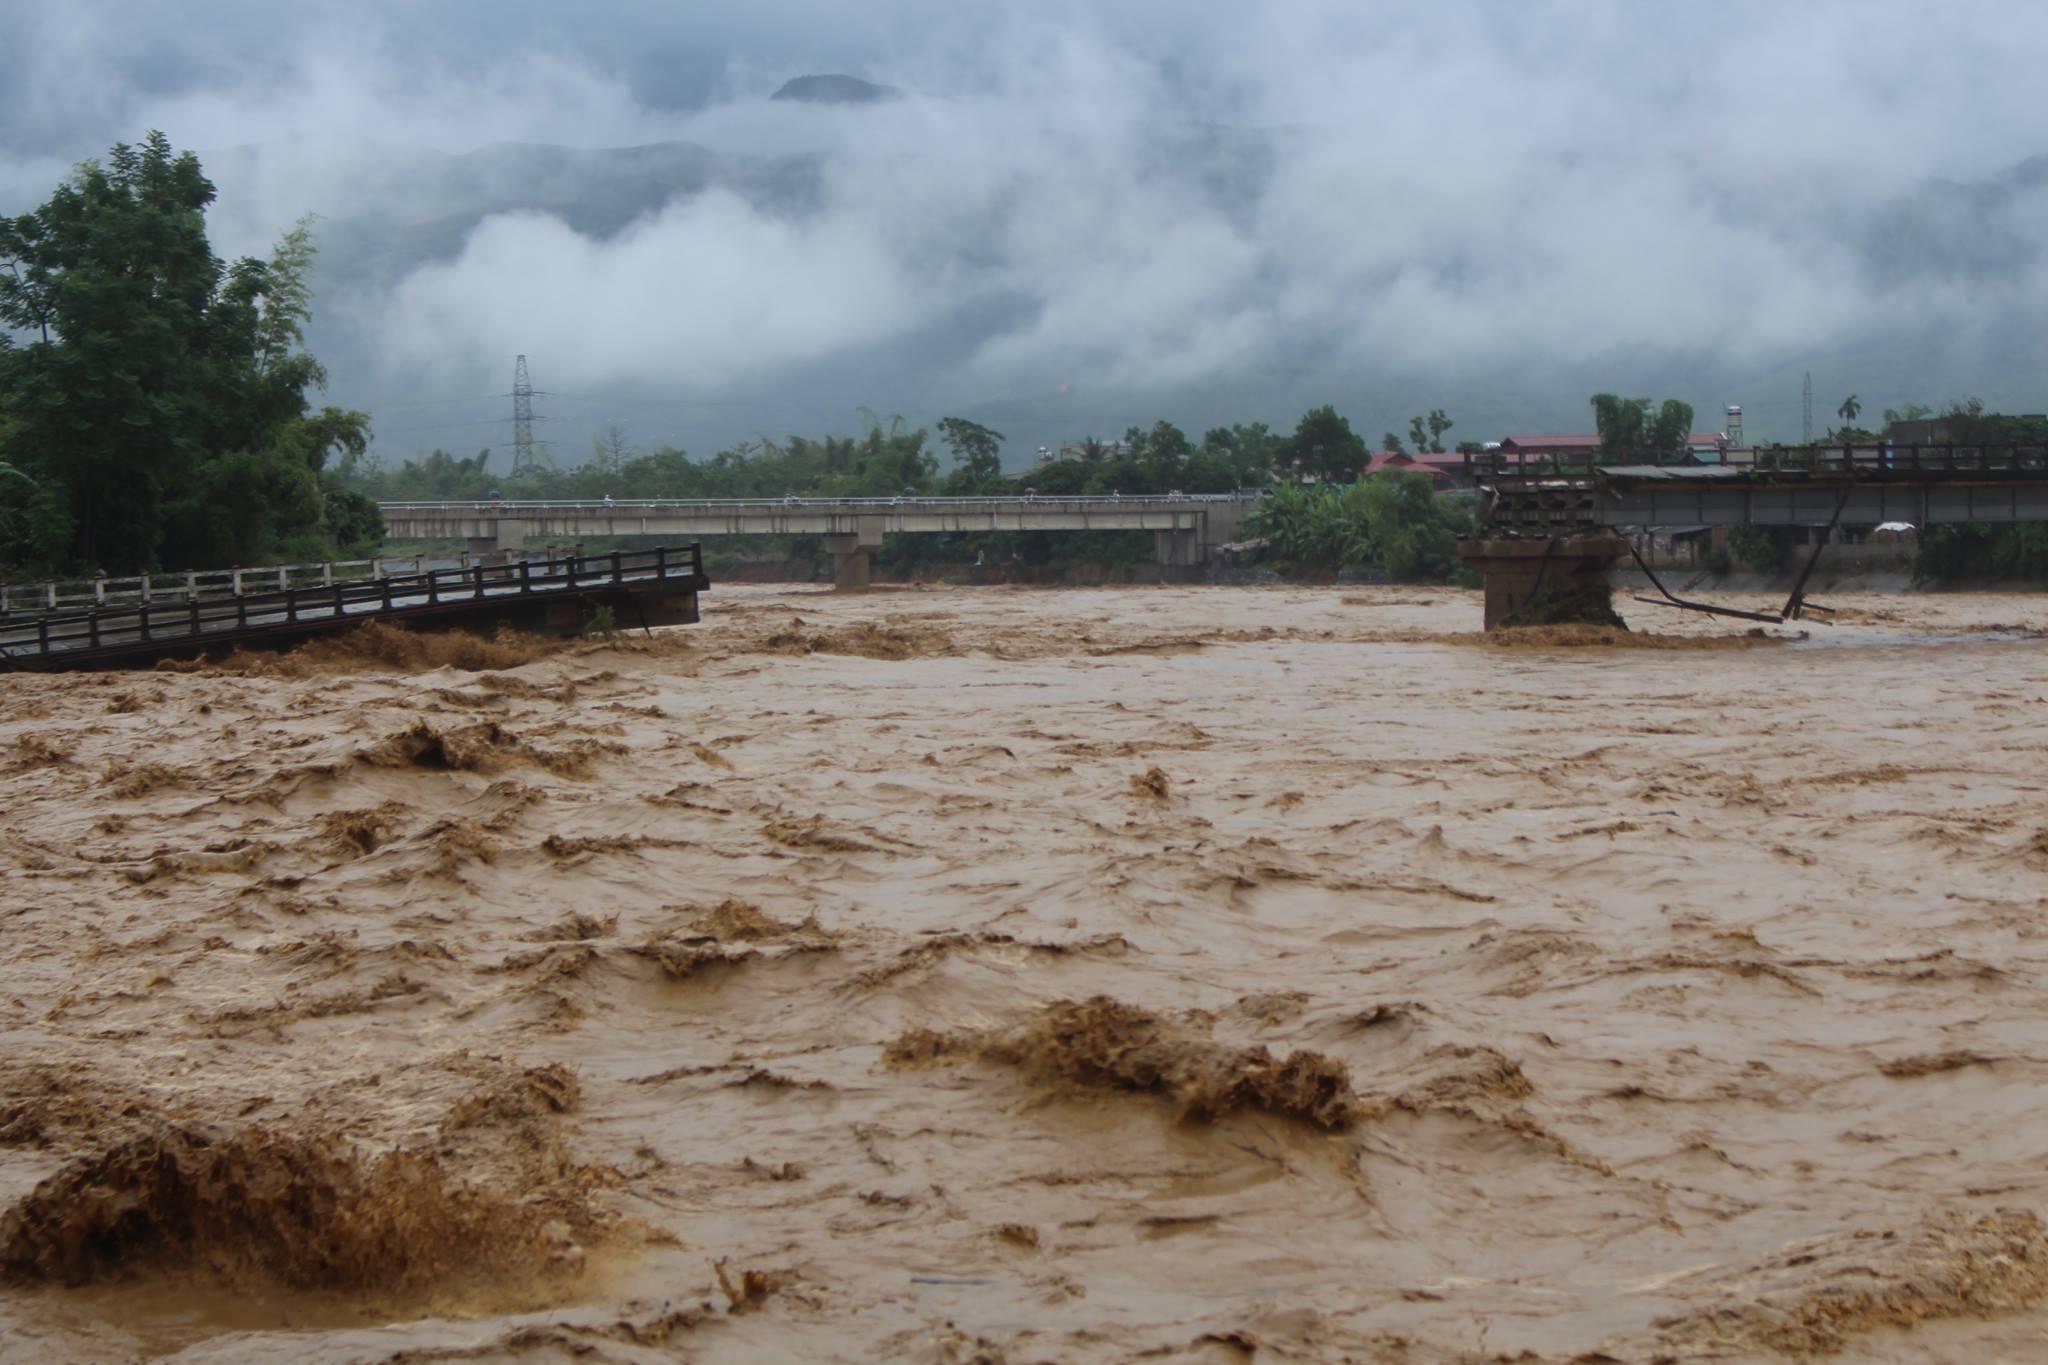 Floods kill at least 40 in Vietnam